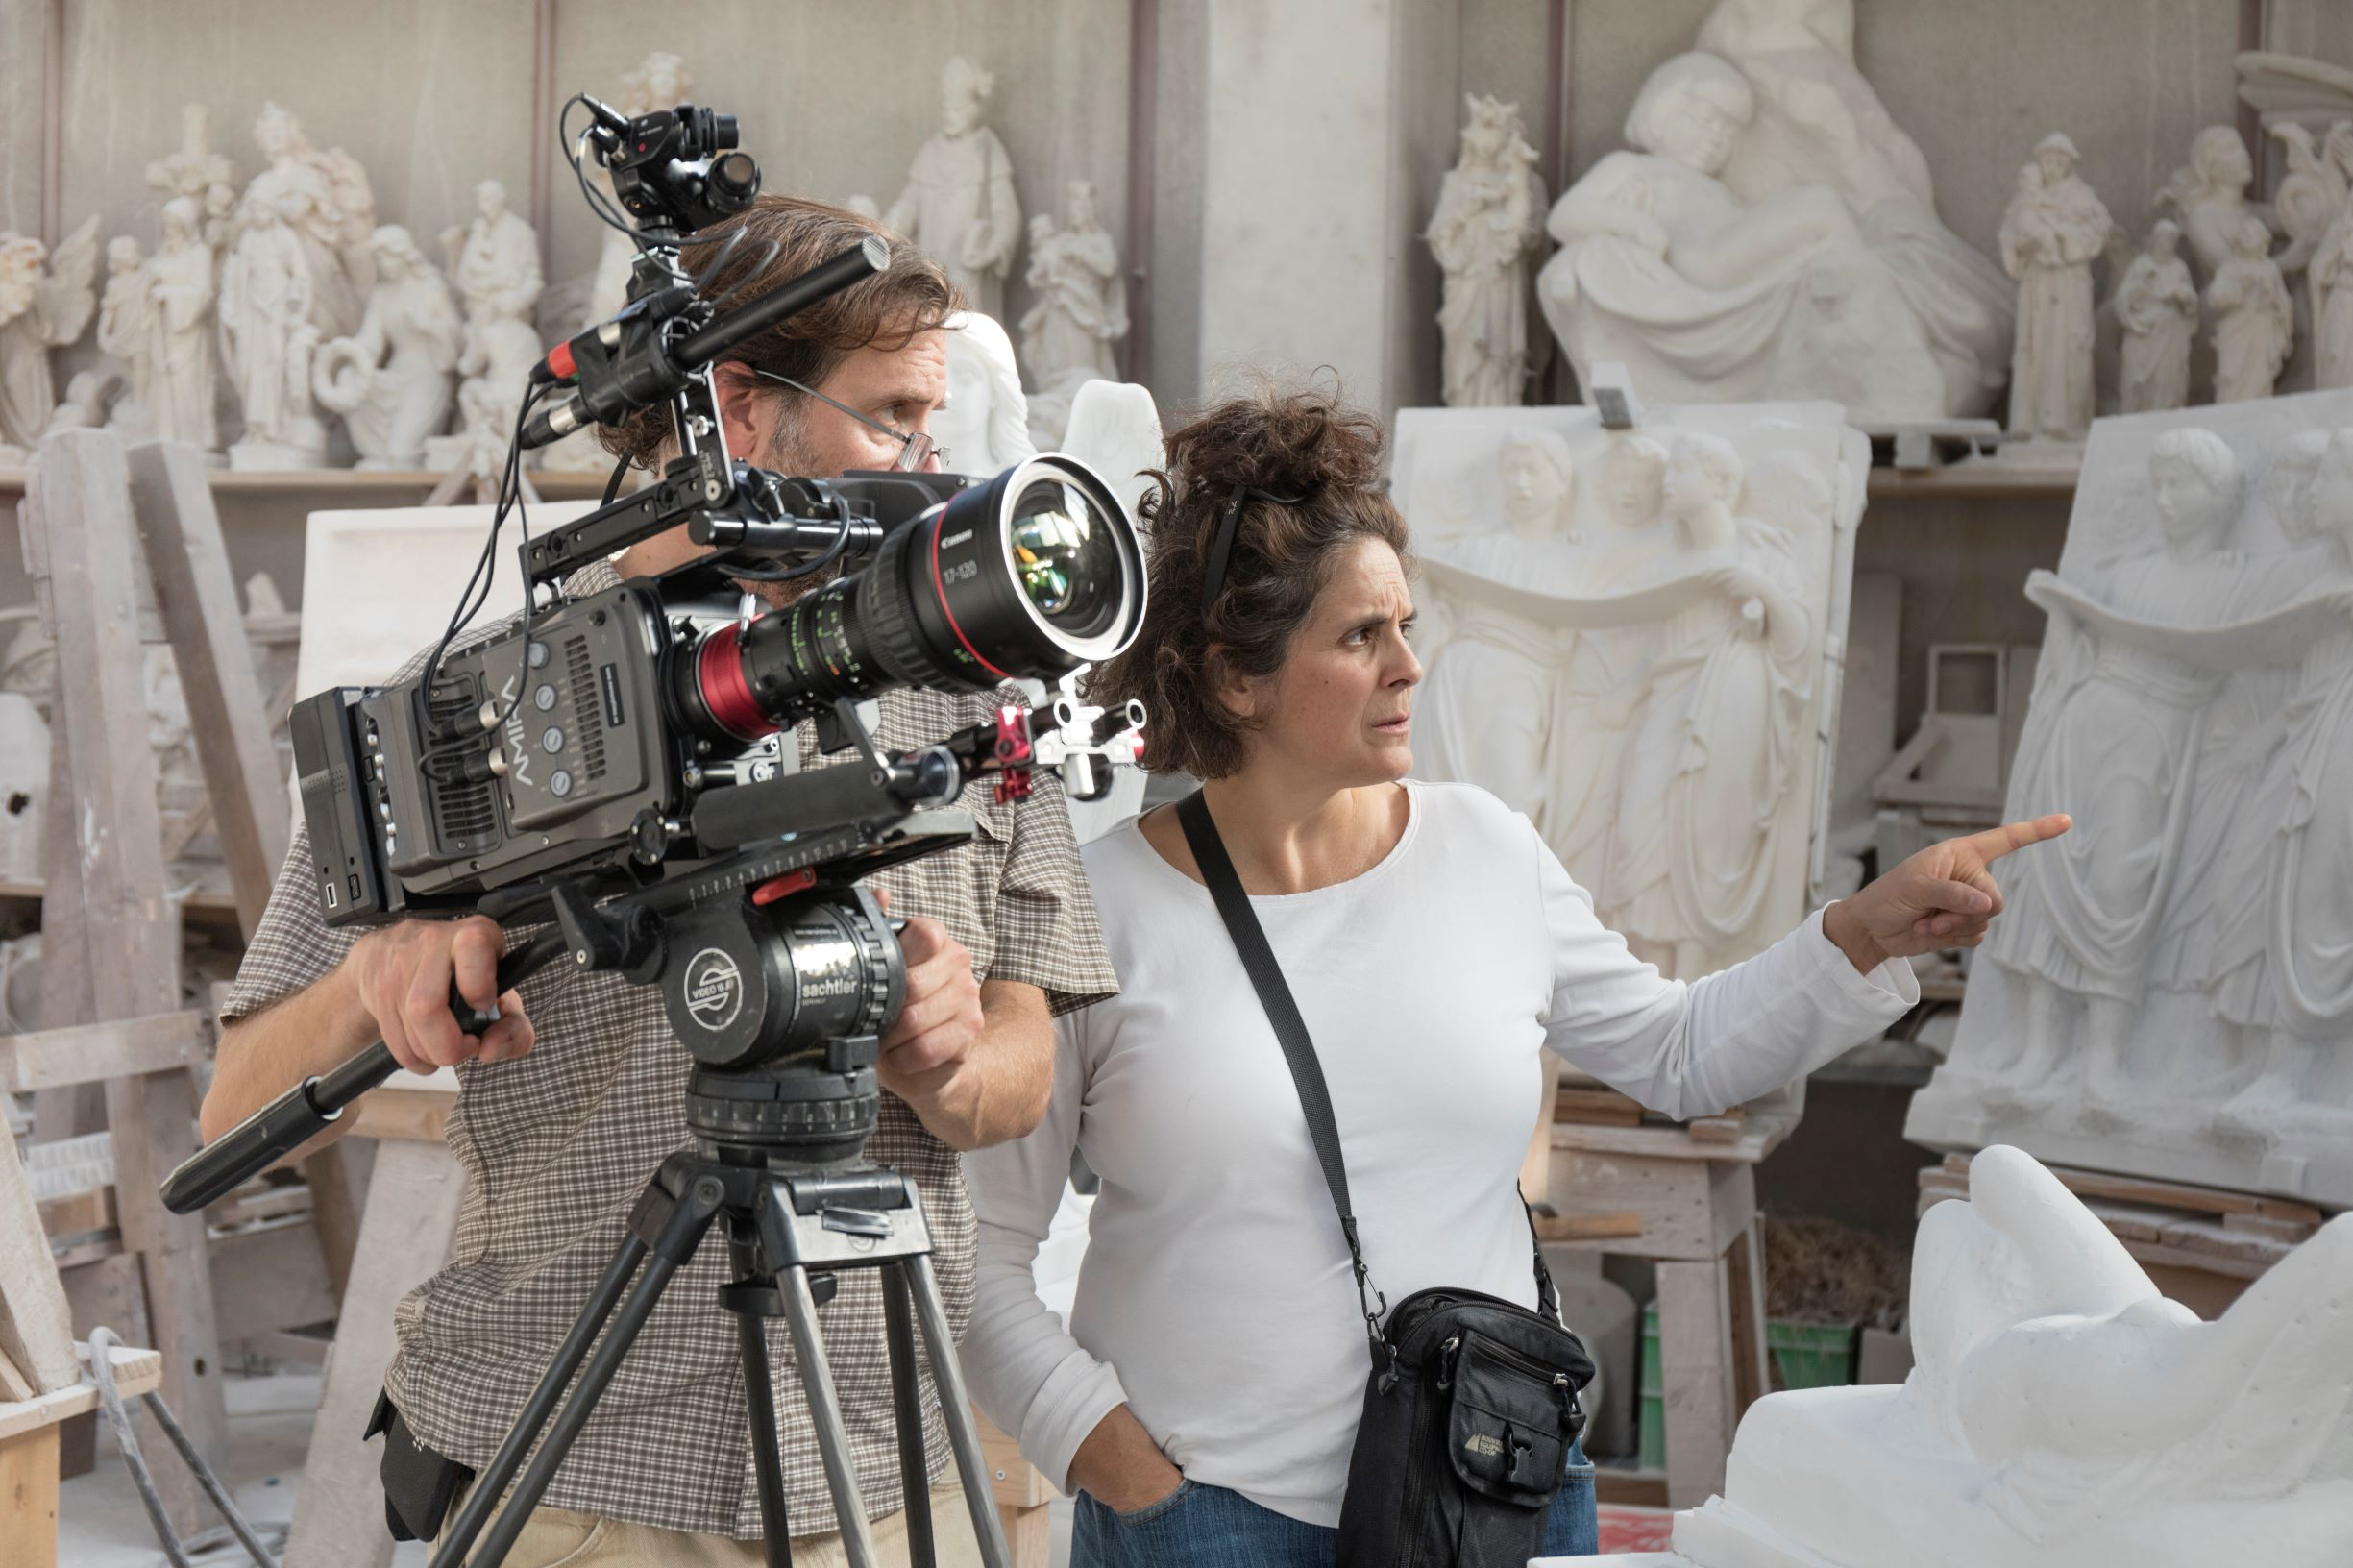 I registi Jennifer Baichwal e Nicholas de Pencier